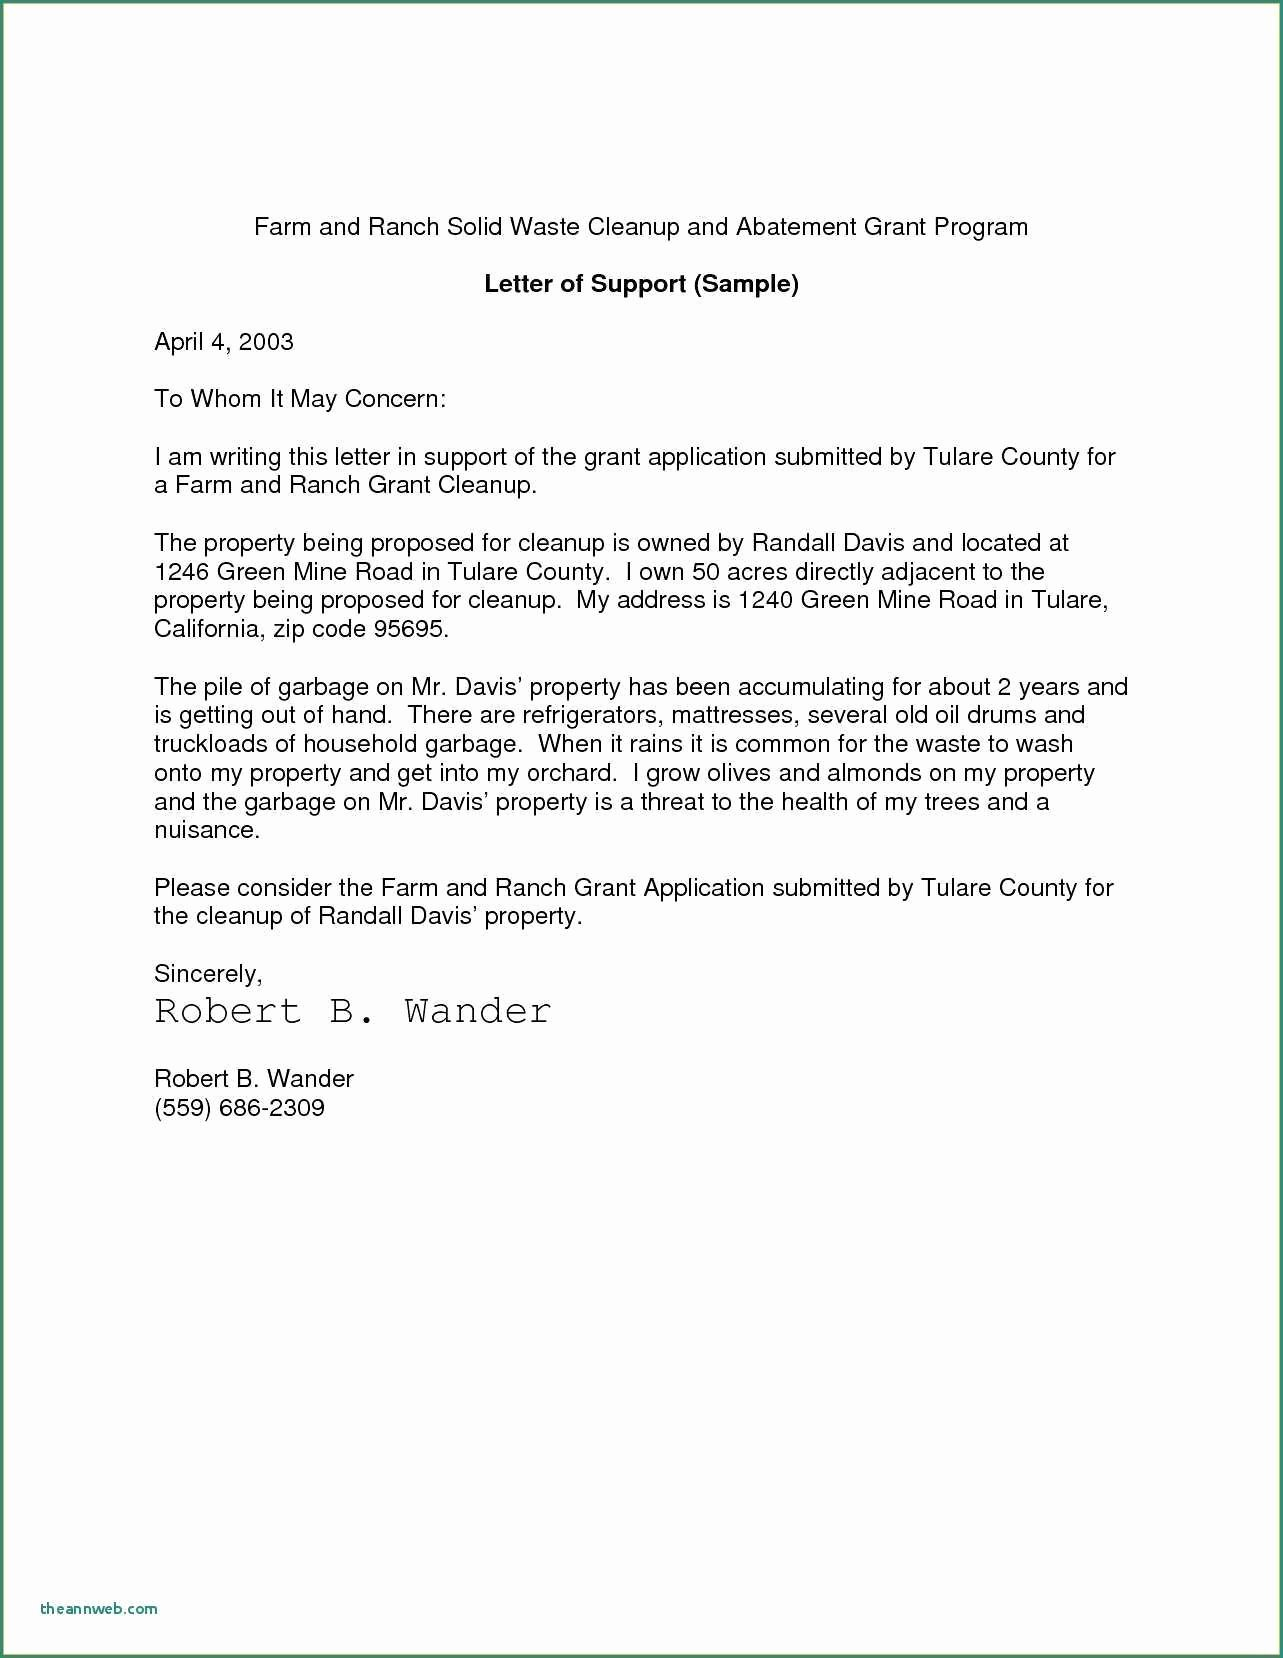 Affidavit Of Support Example Letters Elegant Affidavit Support Example Letters I 751 Cover Letter